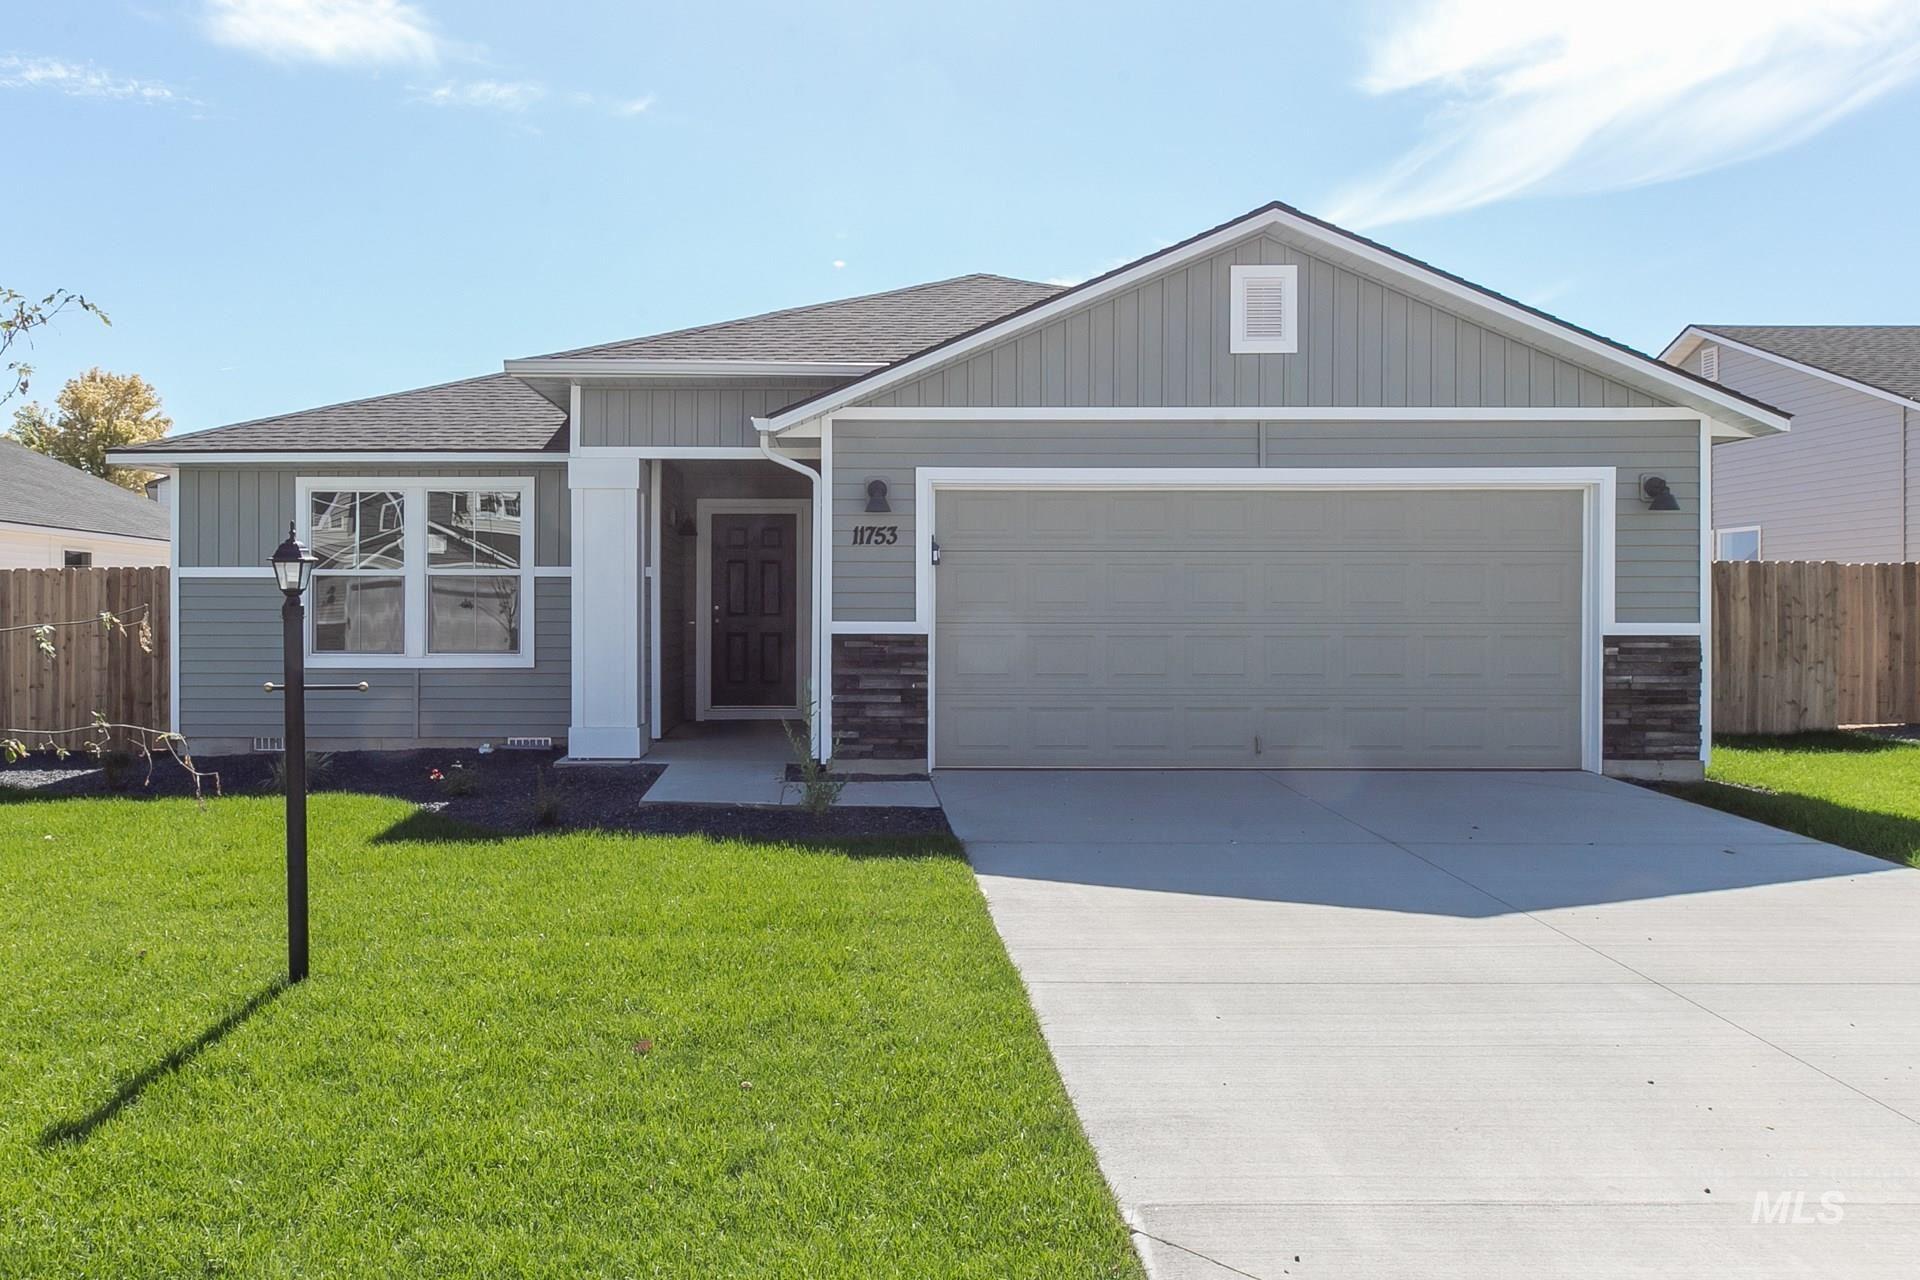 19551 Lenox Ave., Caldwell, ID 83605 - MLS#: 98778632